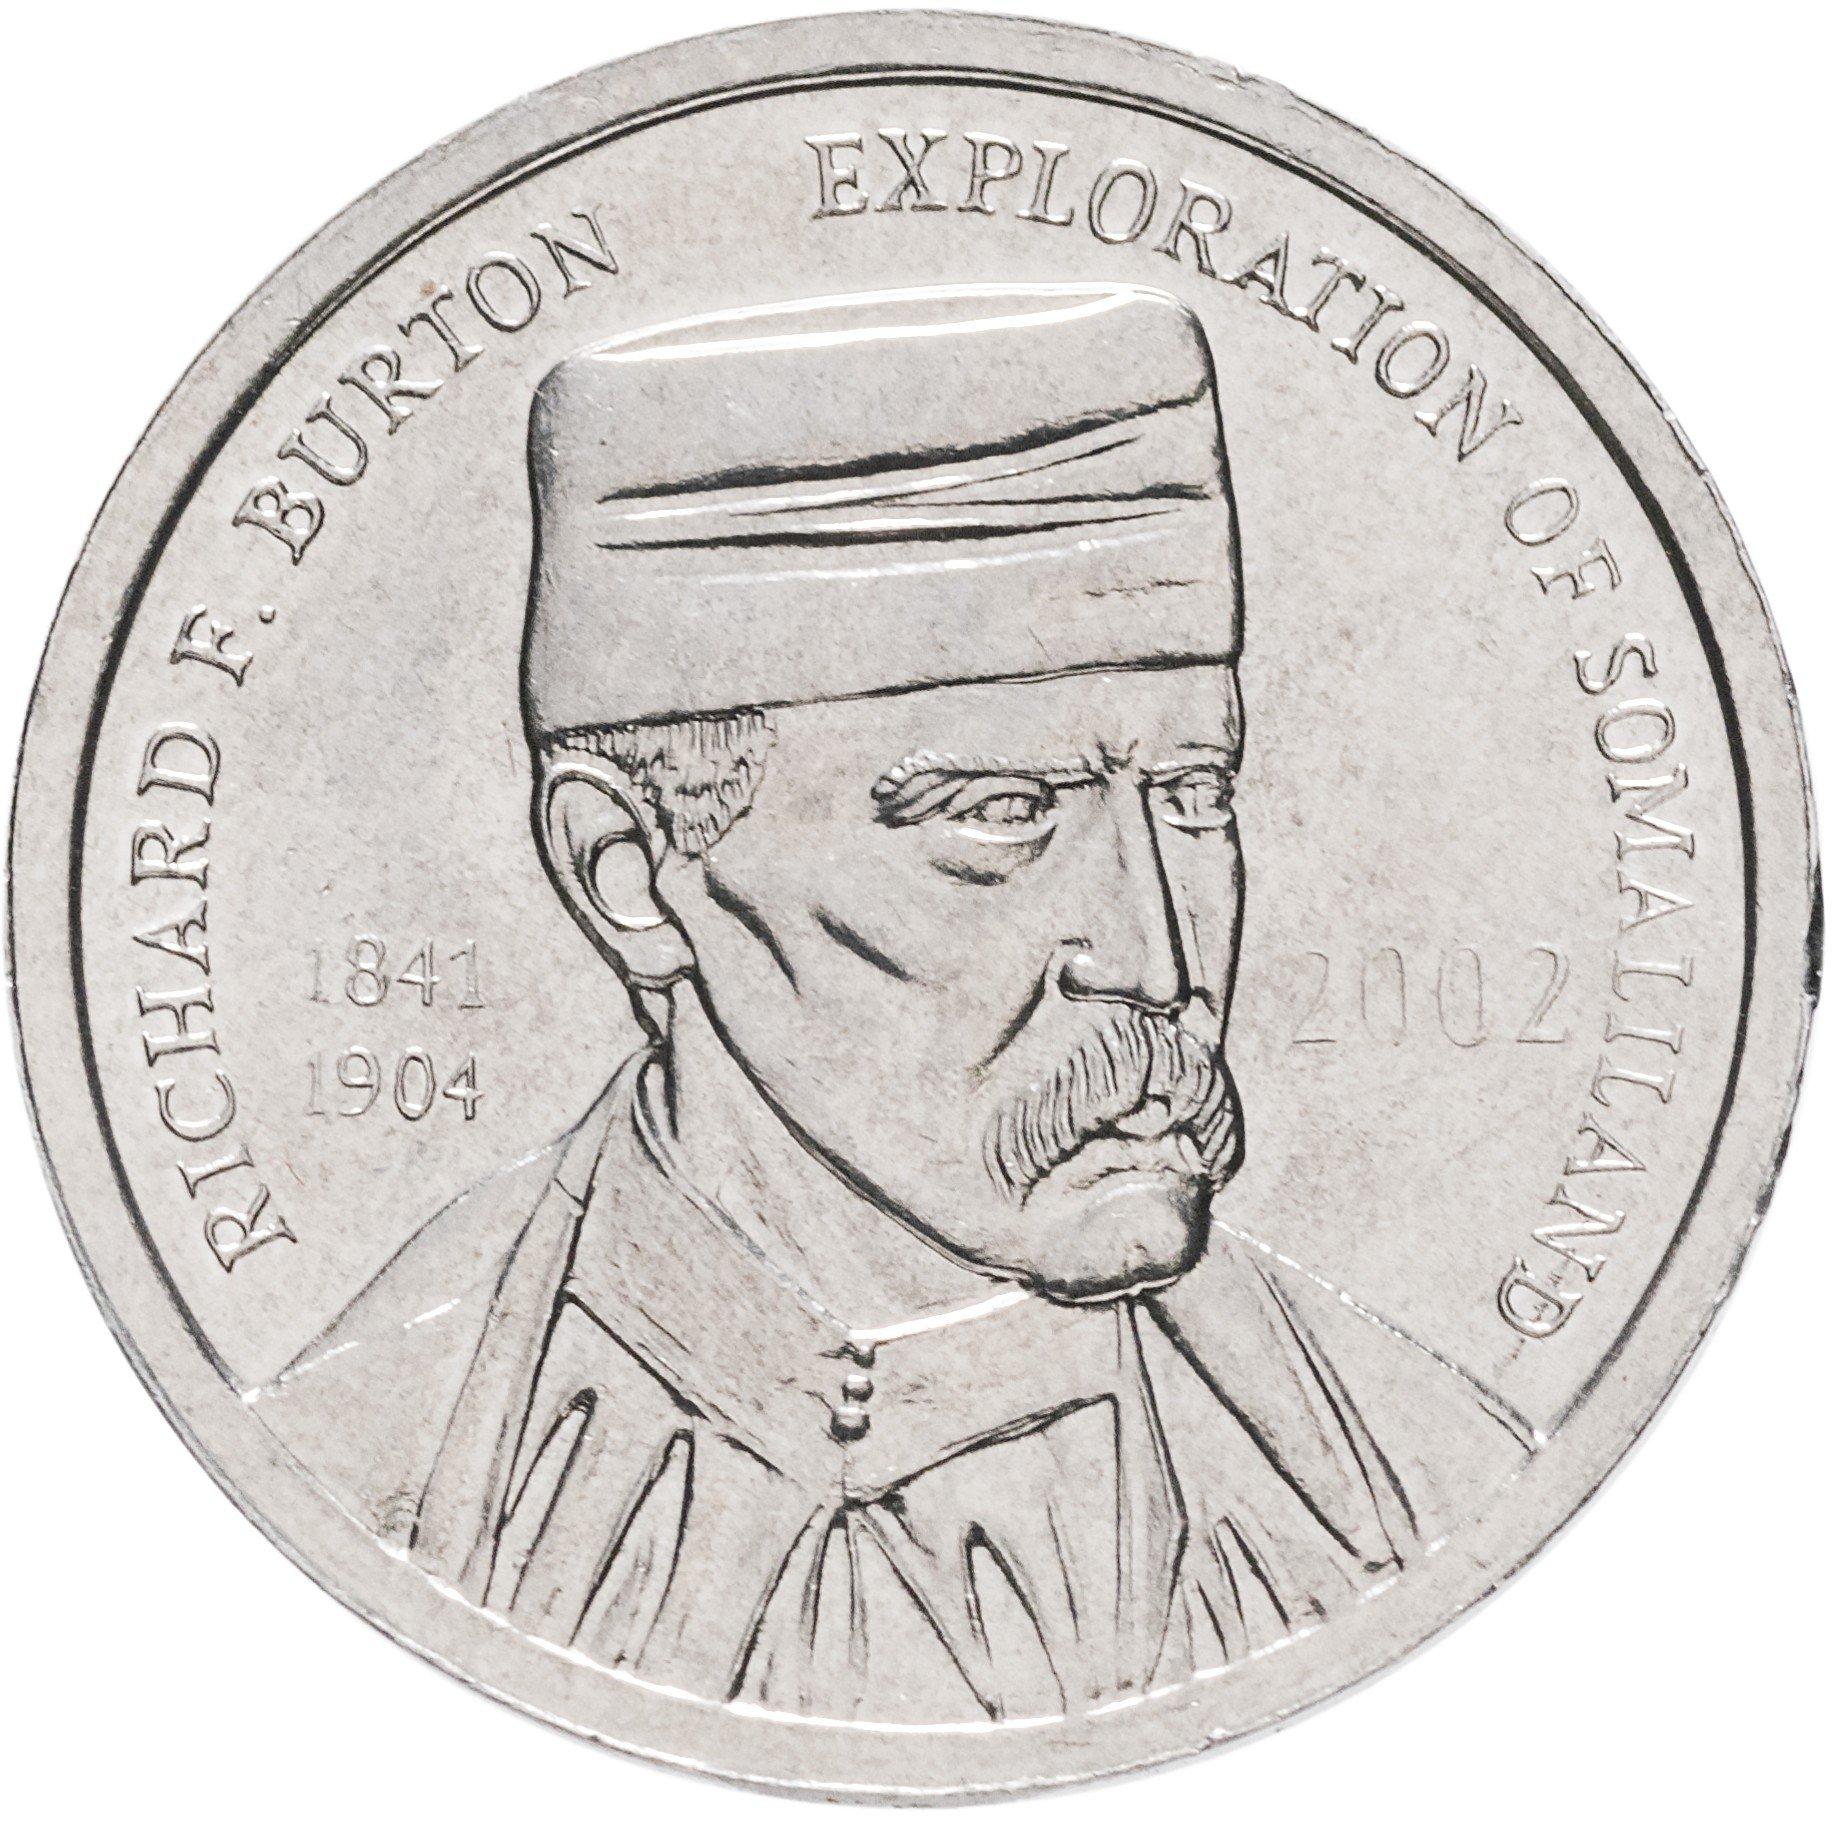 Сомалиленд 5 шиллингов 2002 титаник